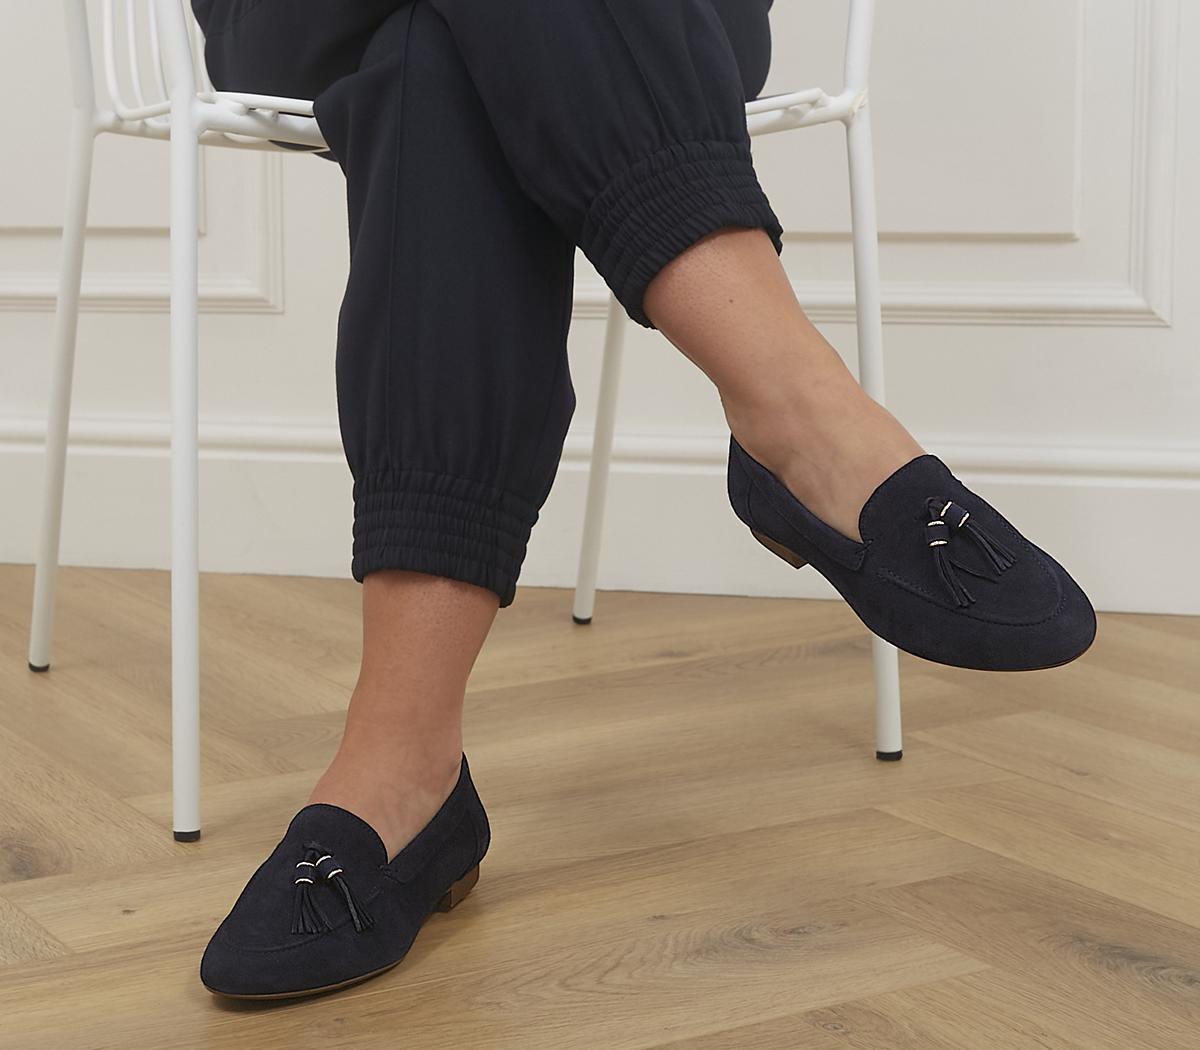 Flick Retro Tassle Loafers